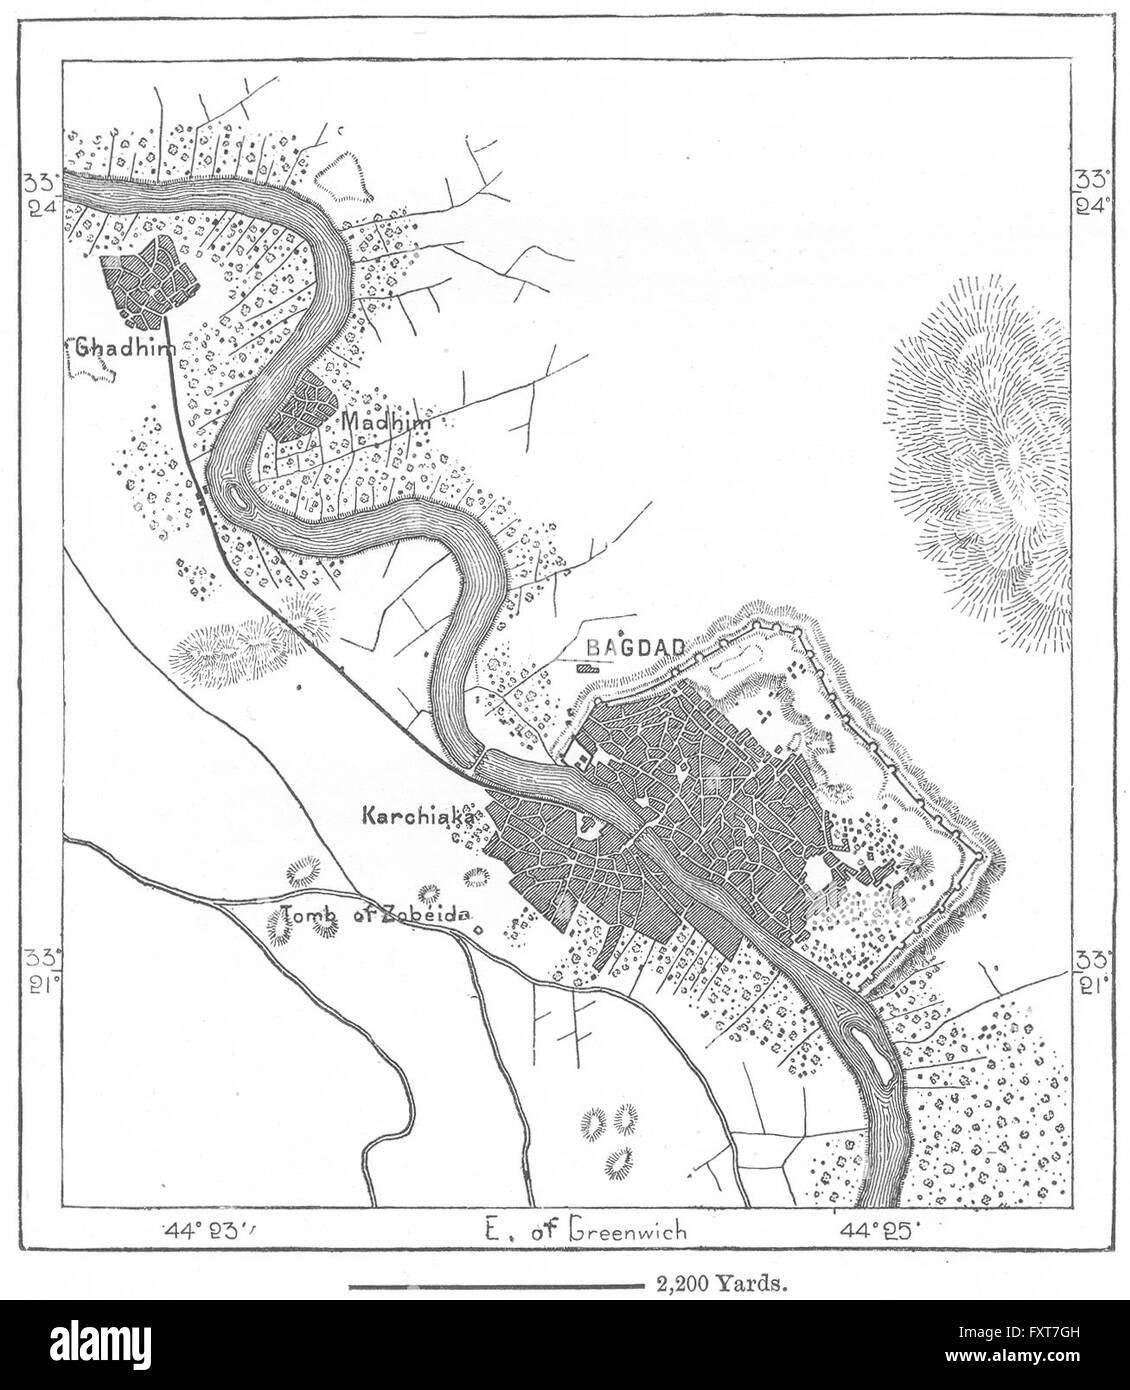 iraq baghdad sketch map c1885 stock image